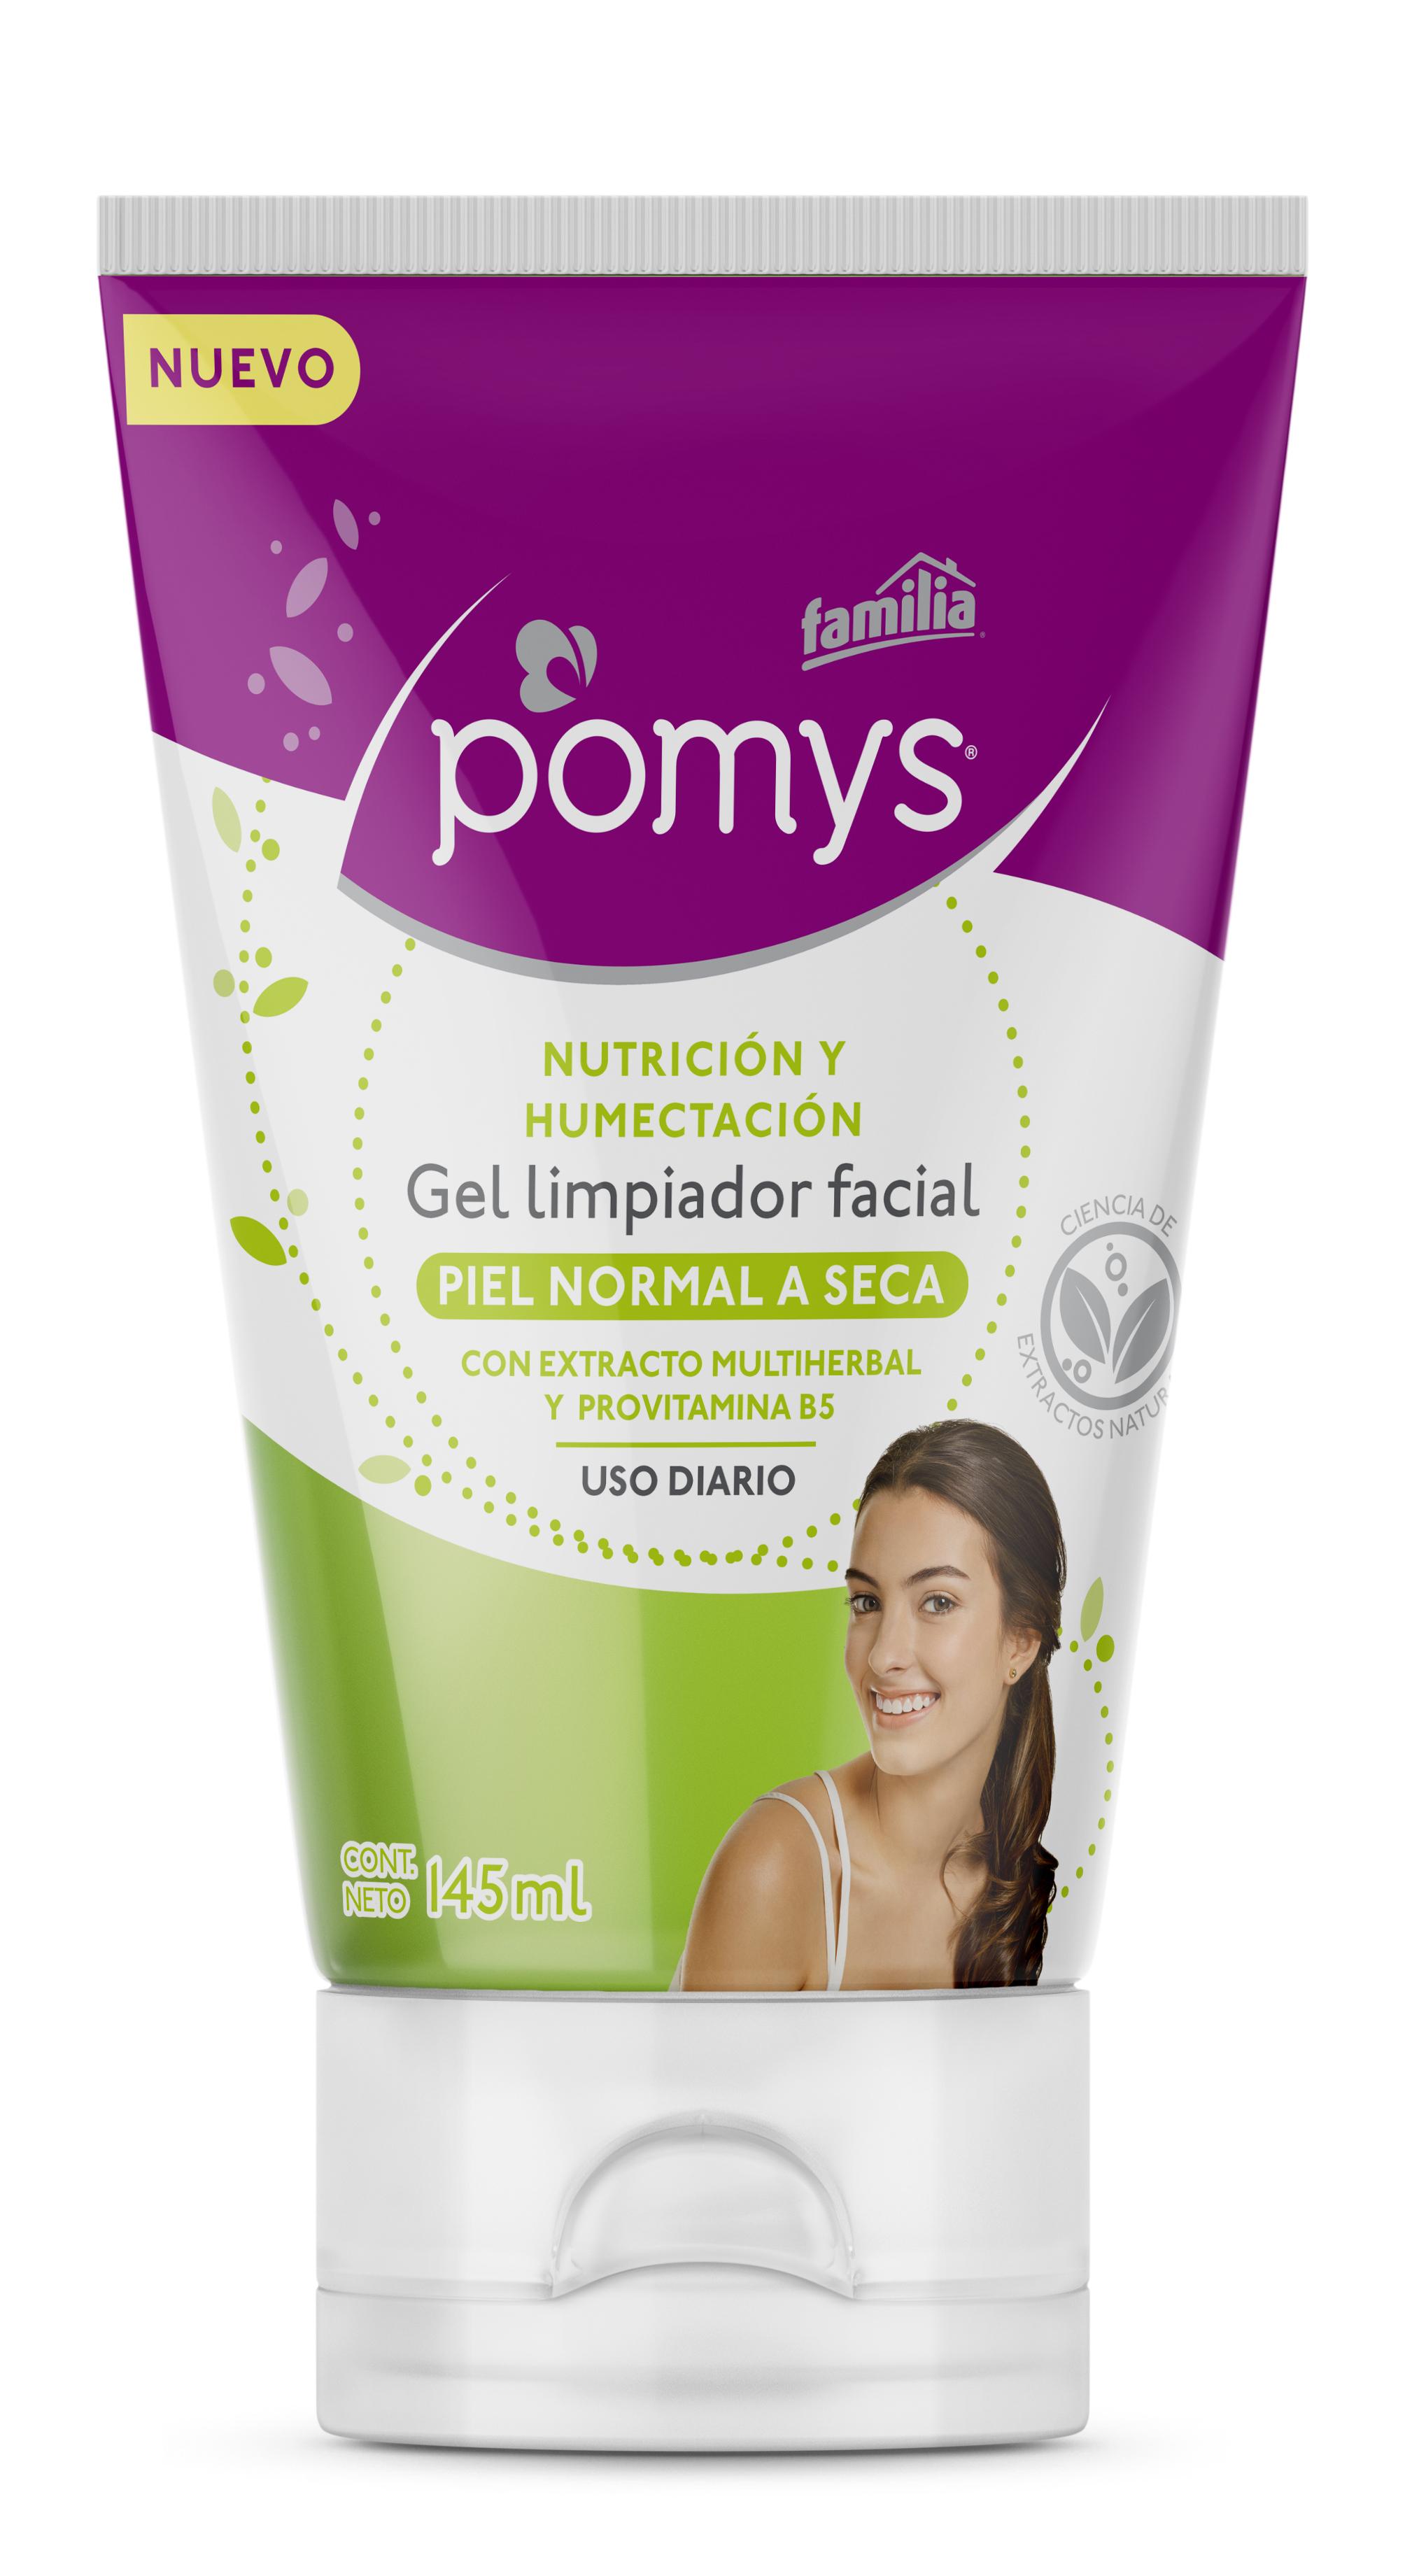 gel Facial Pomys Piel Normal a Seca 145ml